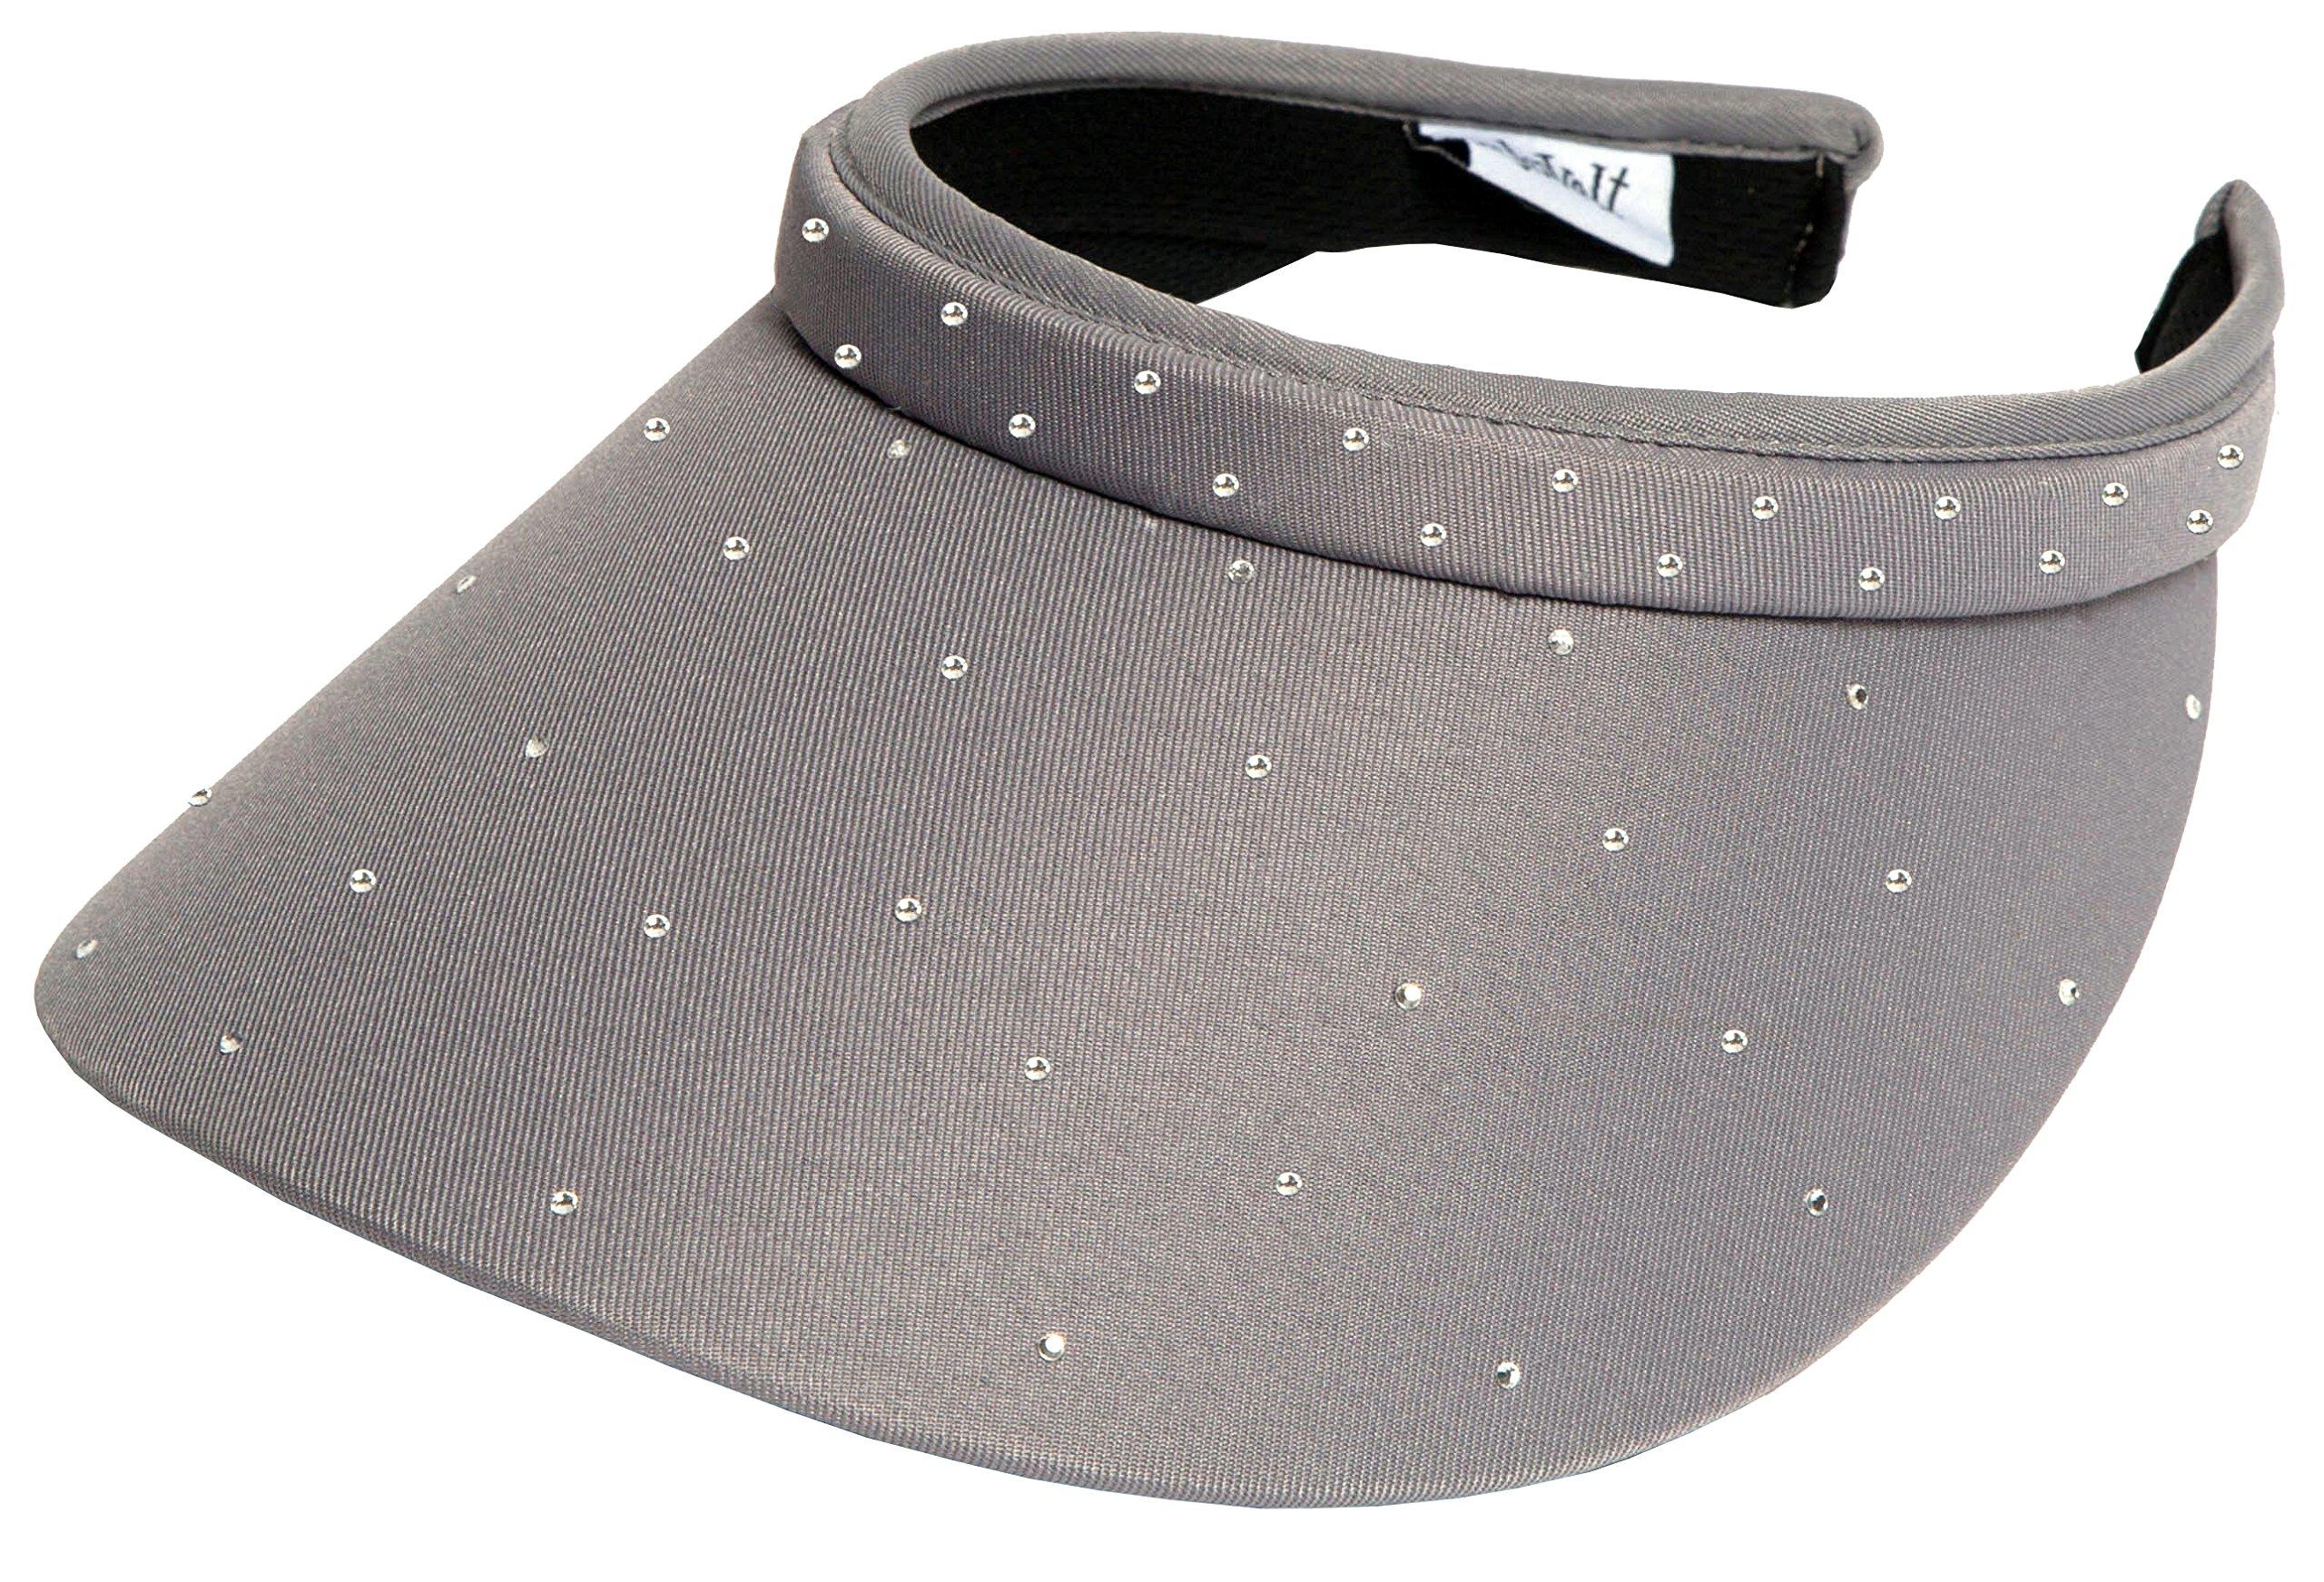 Glove It Women's Clip On Visor Golf & Tennis Head Visors for Women - UV 50 Protection - Ladies Sun Visor Hat - Large Wide Brim - Grey Bling by Glove It